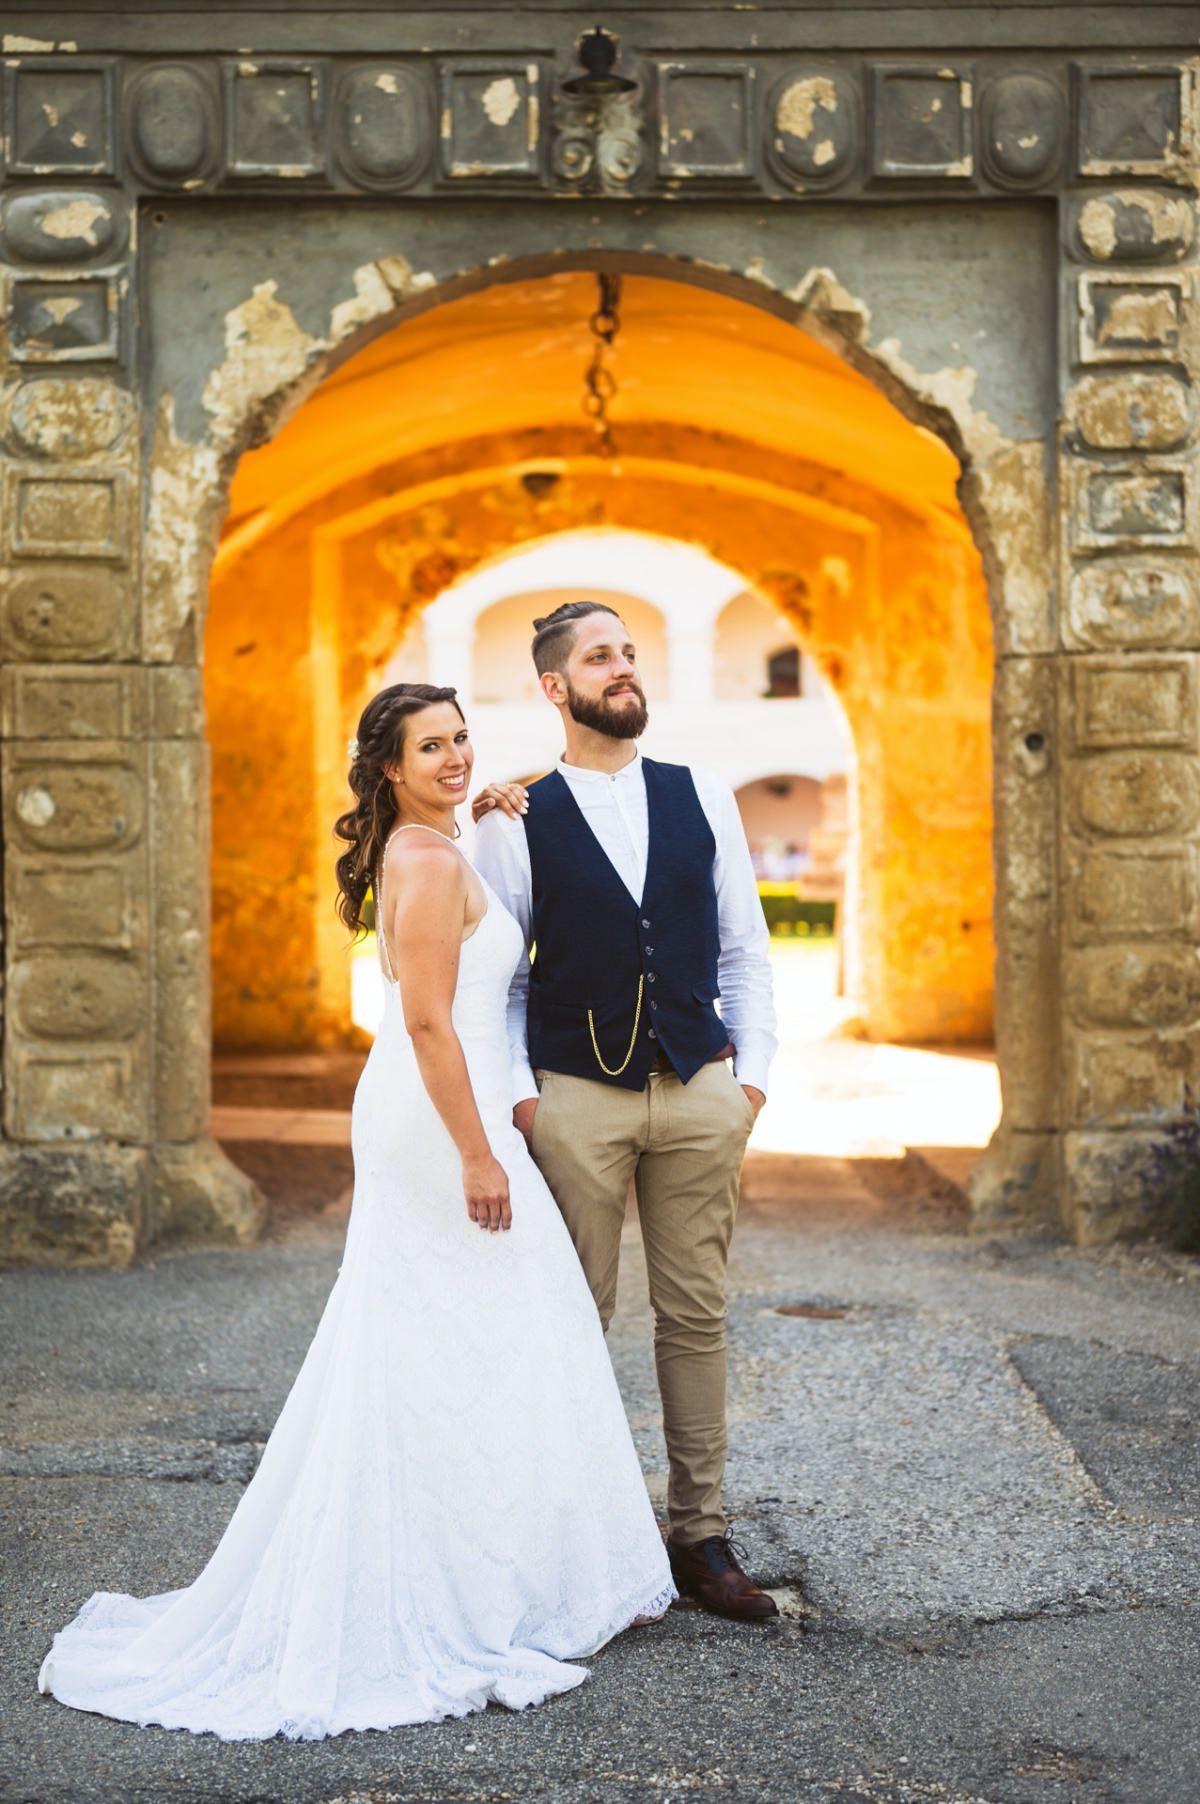 58 mednarodni par poroka prekmurje - Big homemade wedding